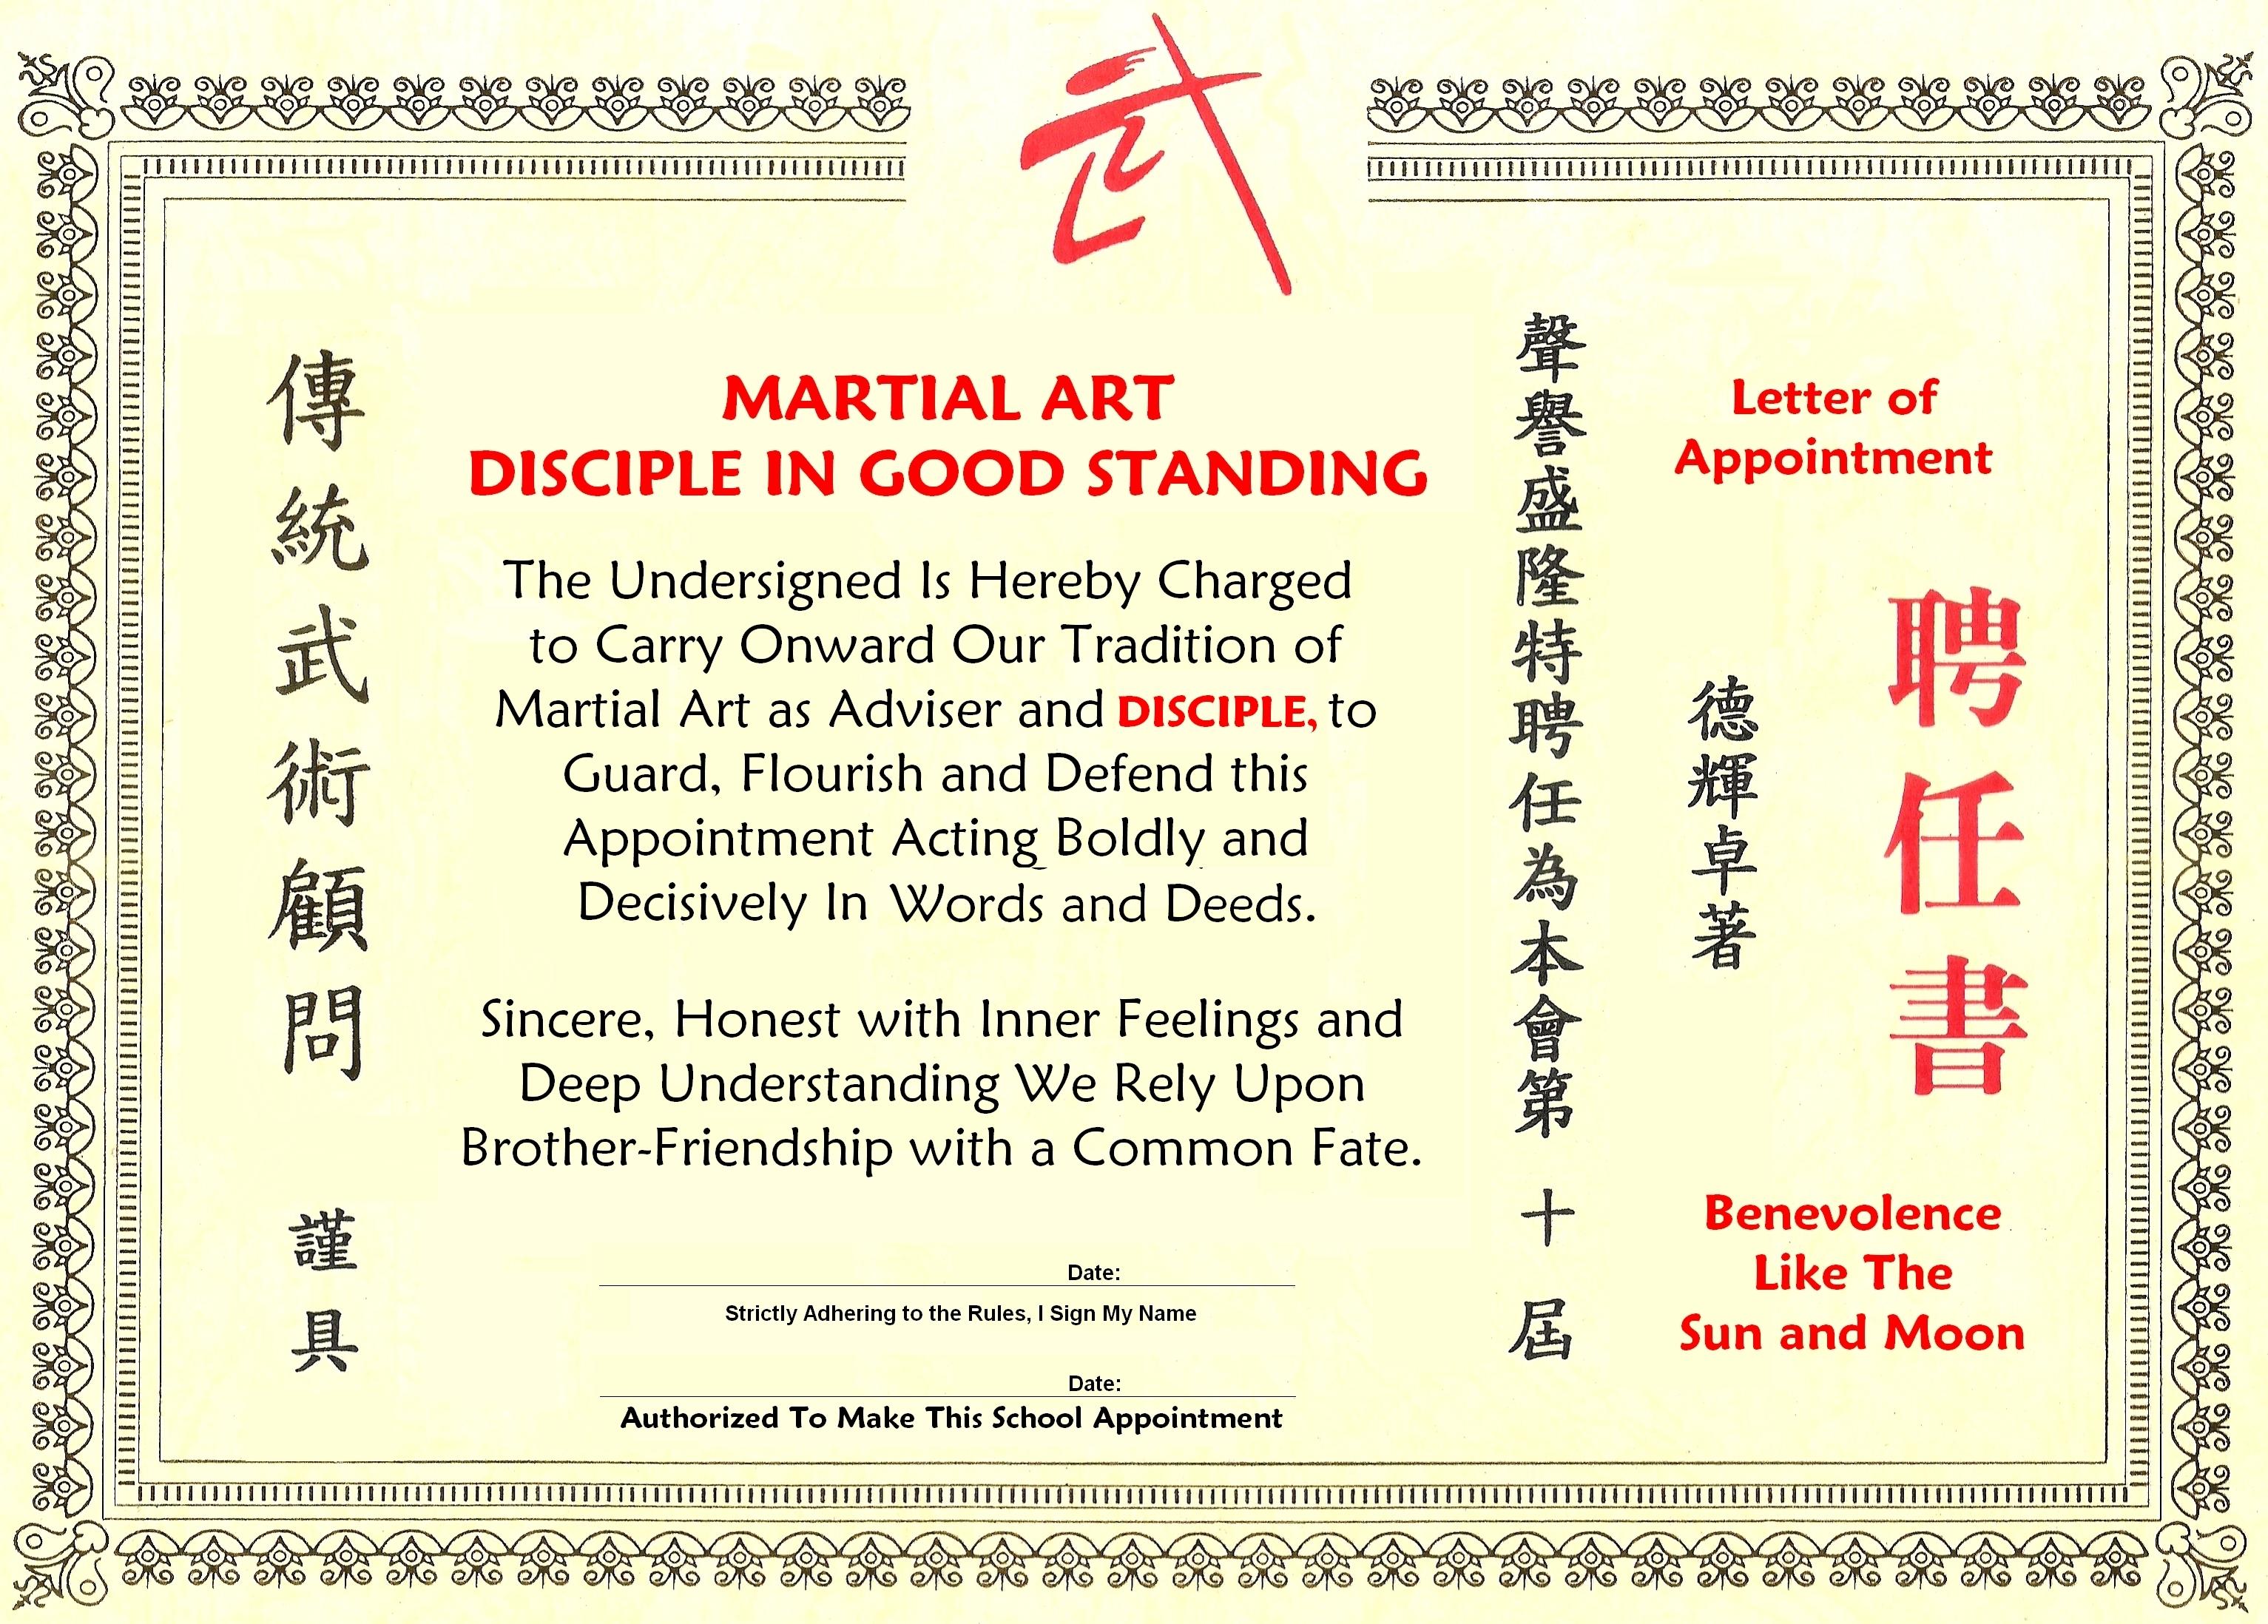 China southern praying mantis kungfu survey for Martial art certificate templates free